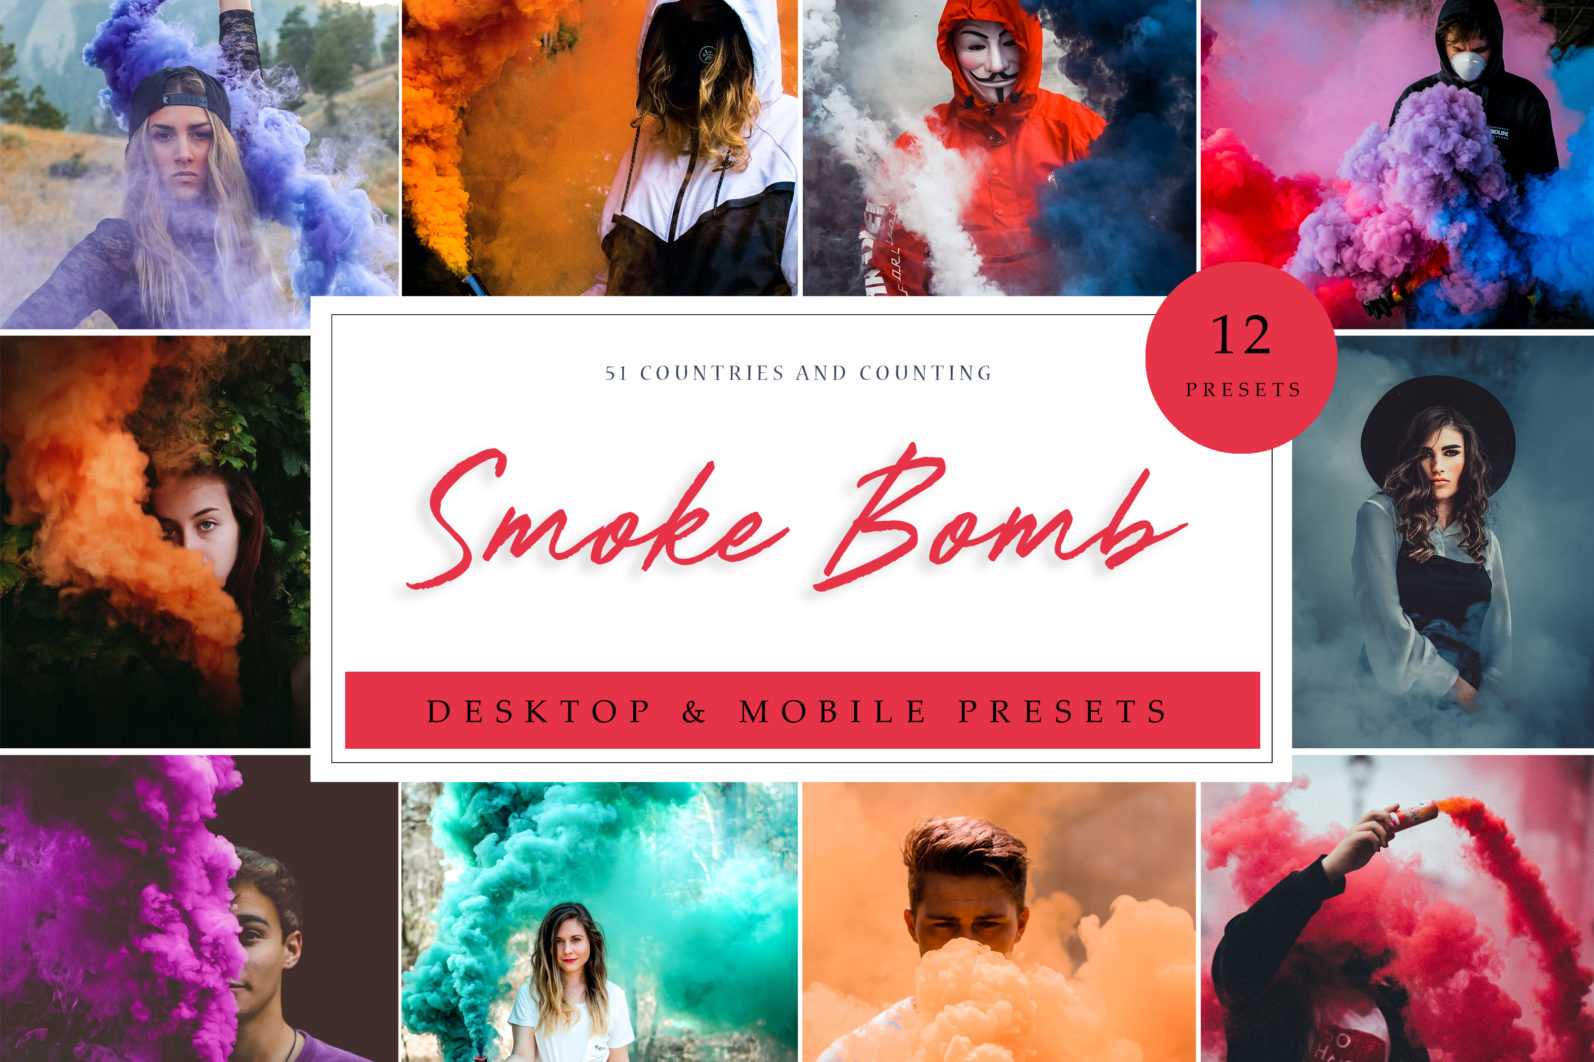 12 Smoke Bomb Lightroom Presets to enhance your Smoke Bomb Photoshoots - Smoke Bomb LR scaled -